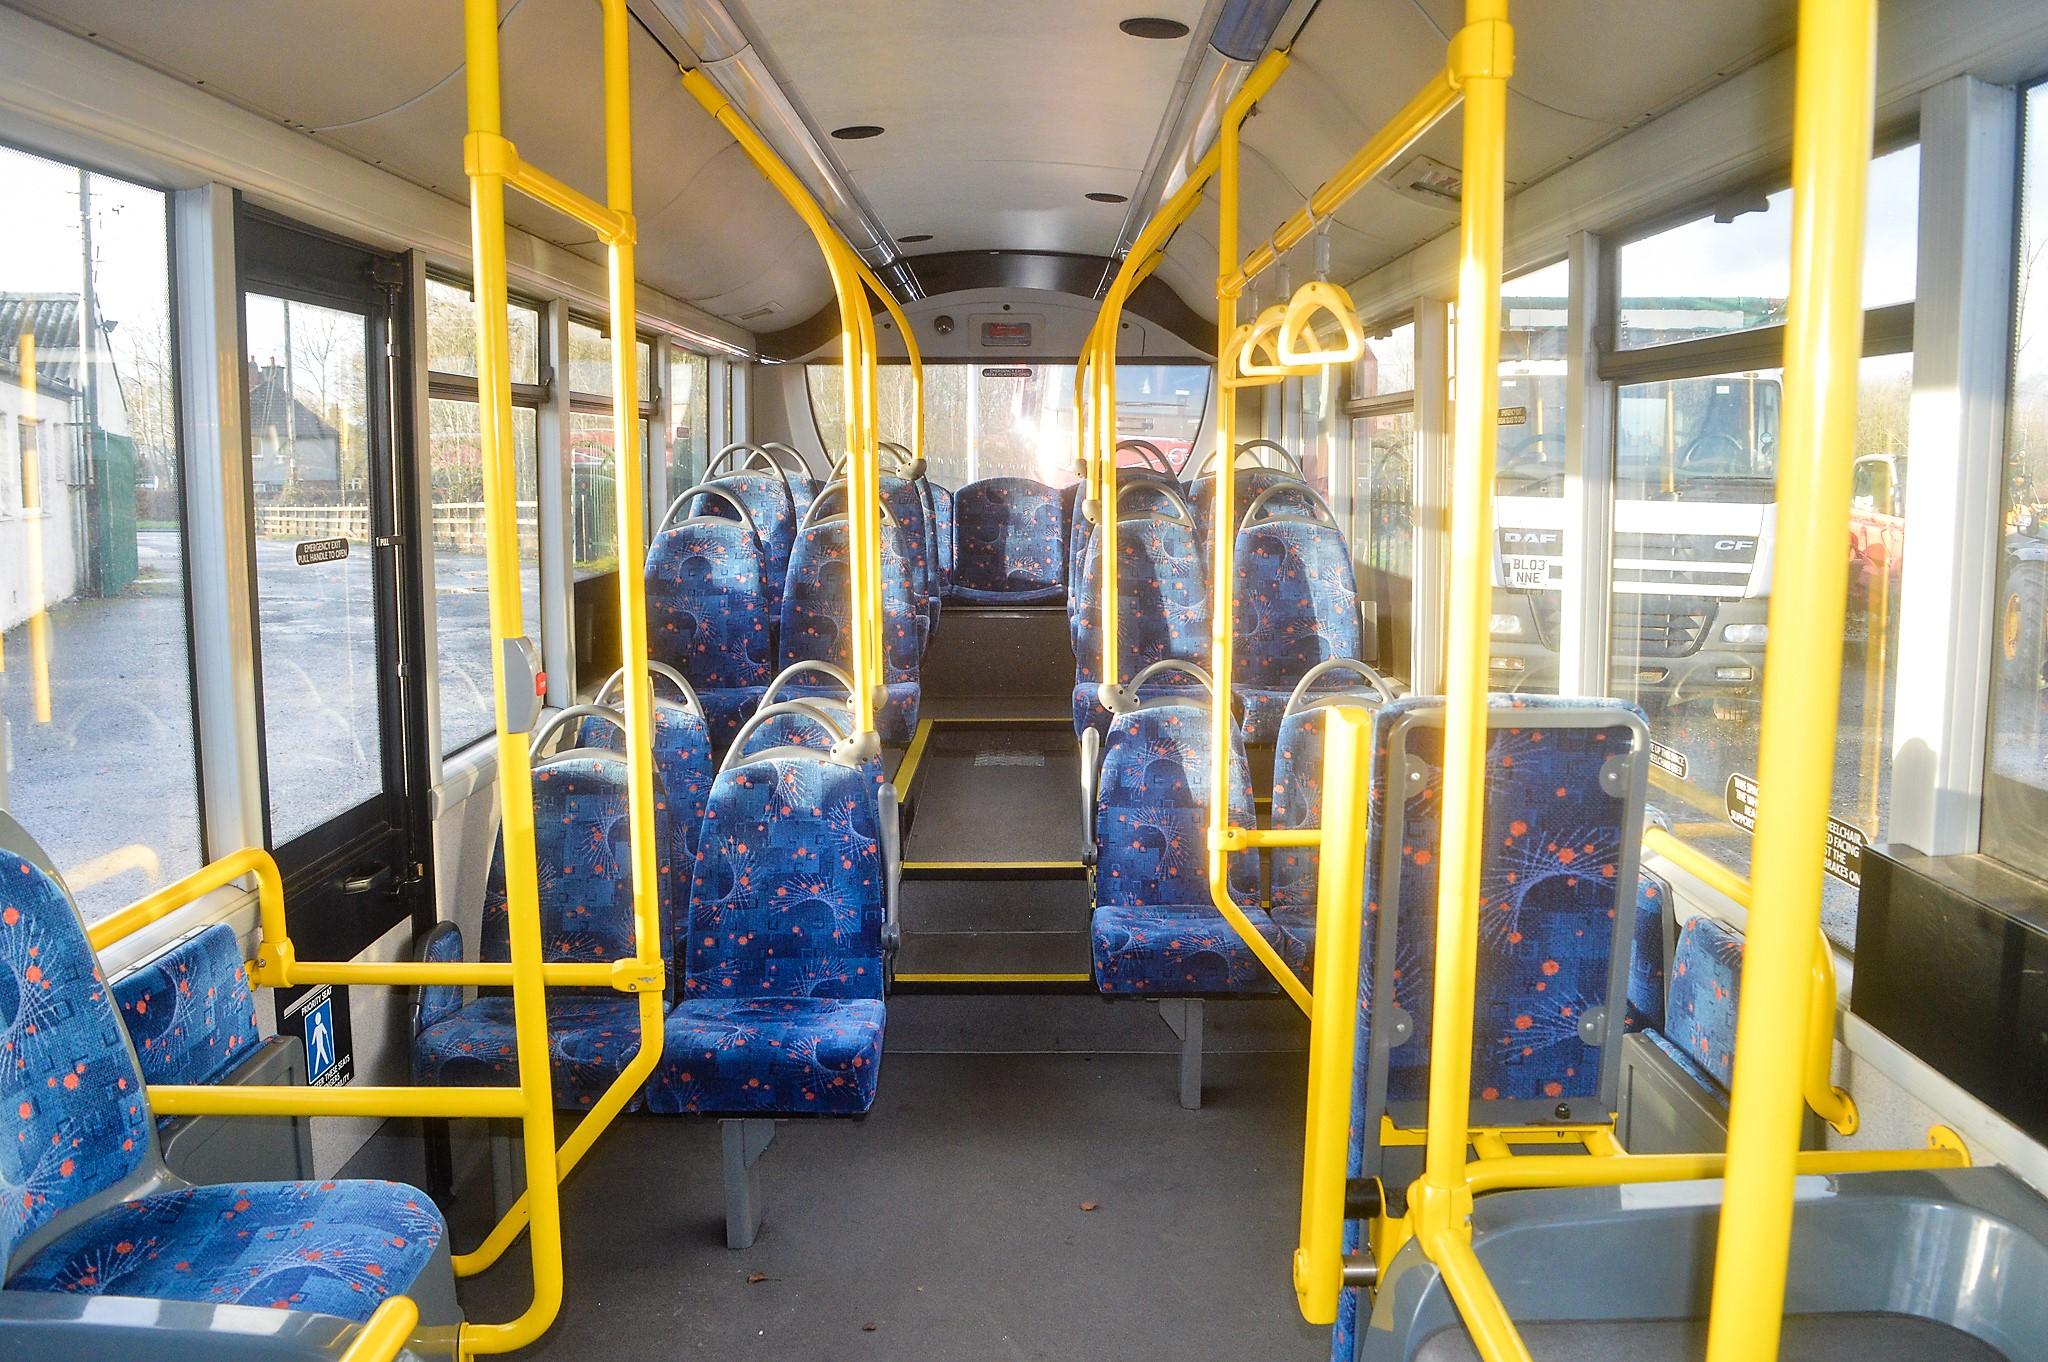 Lot 1 - Alexander Dennis Dart 4 Enviro 2000 29 seat single deck service bus Registration Number: YX12 GGV